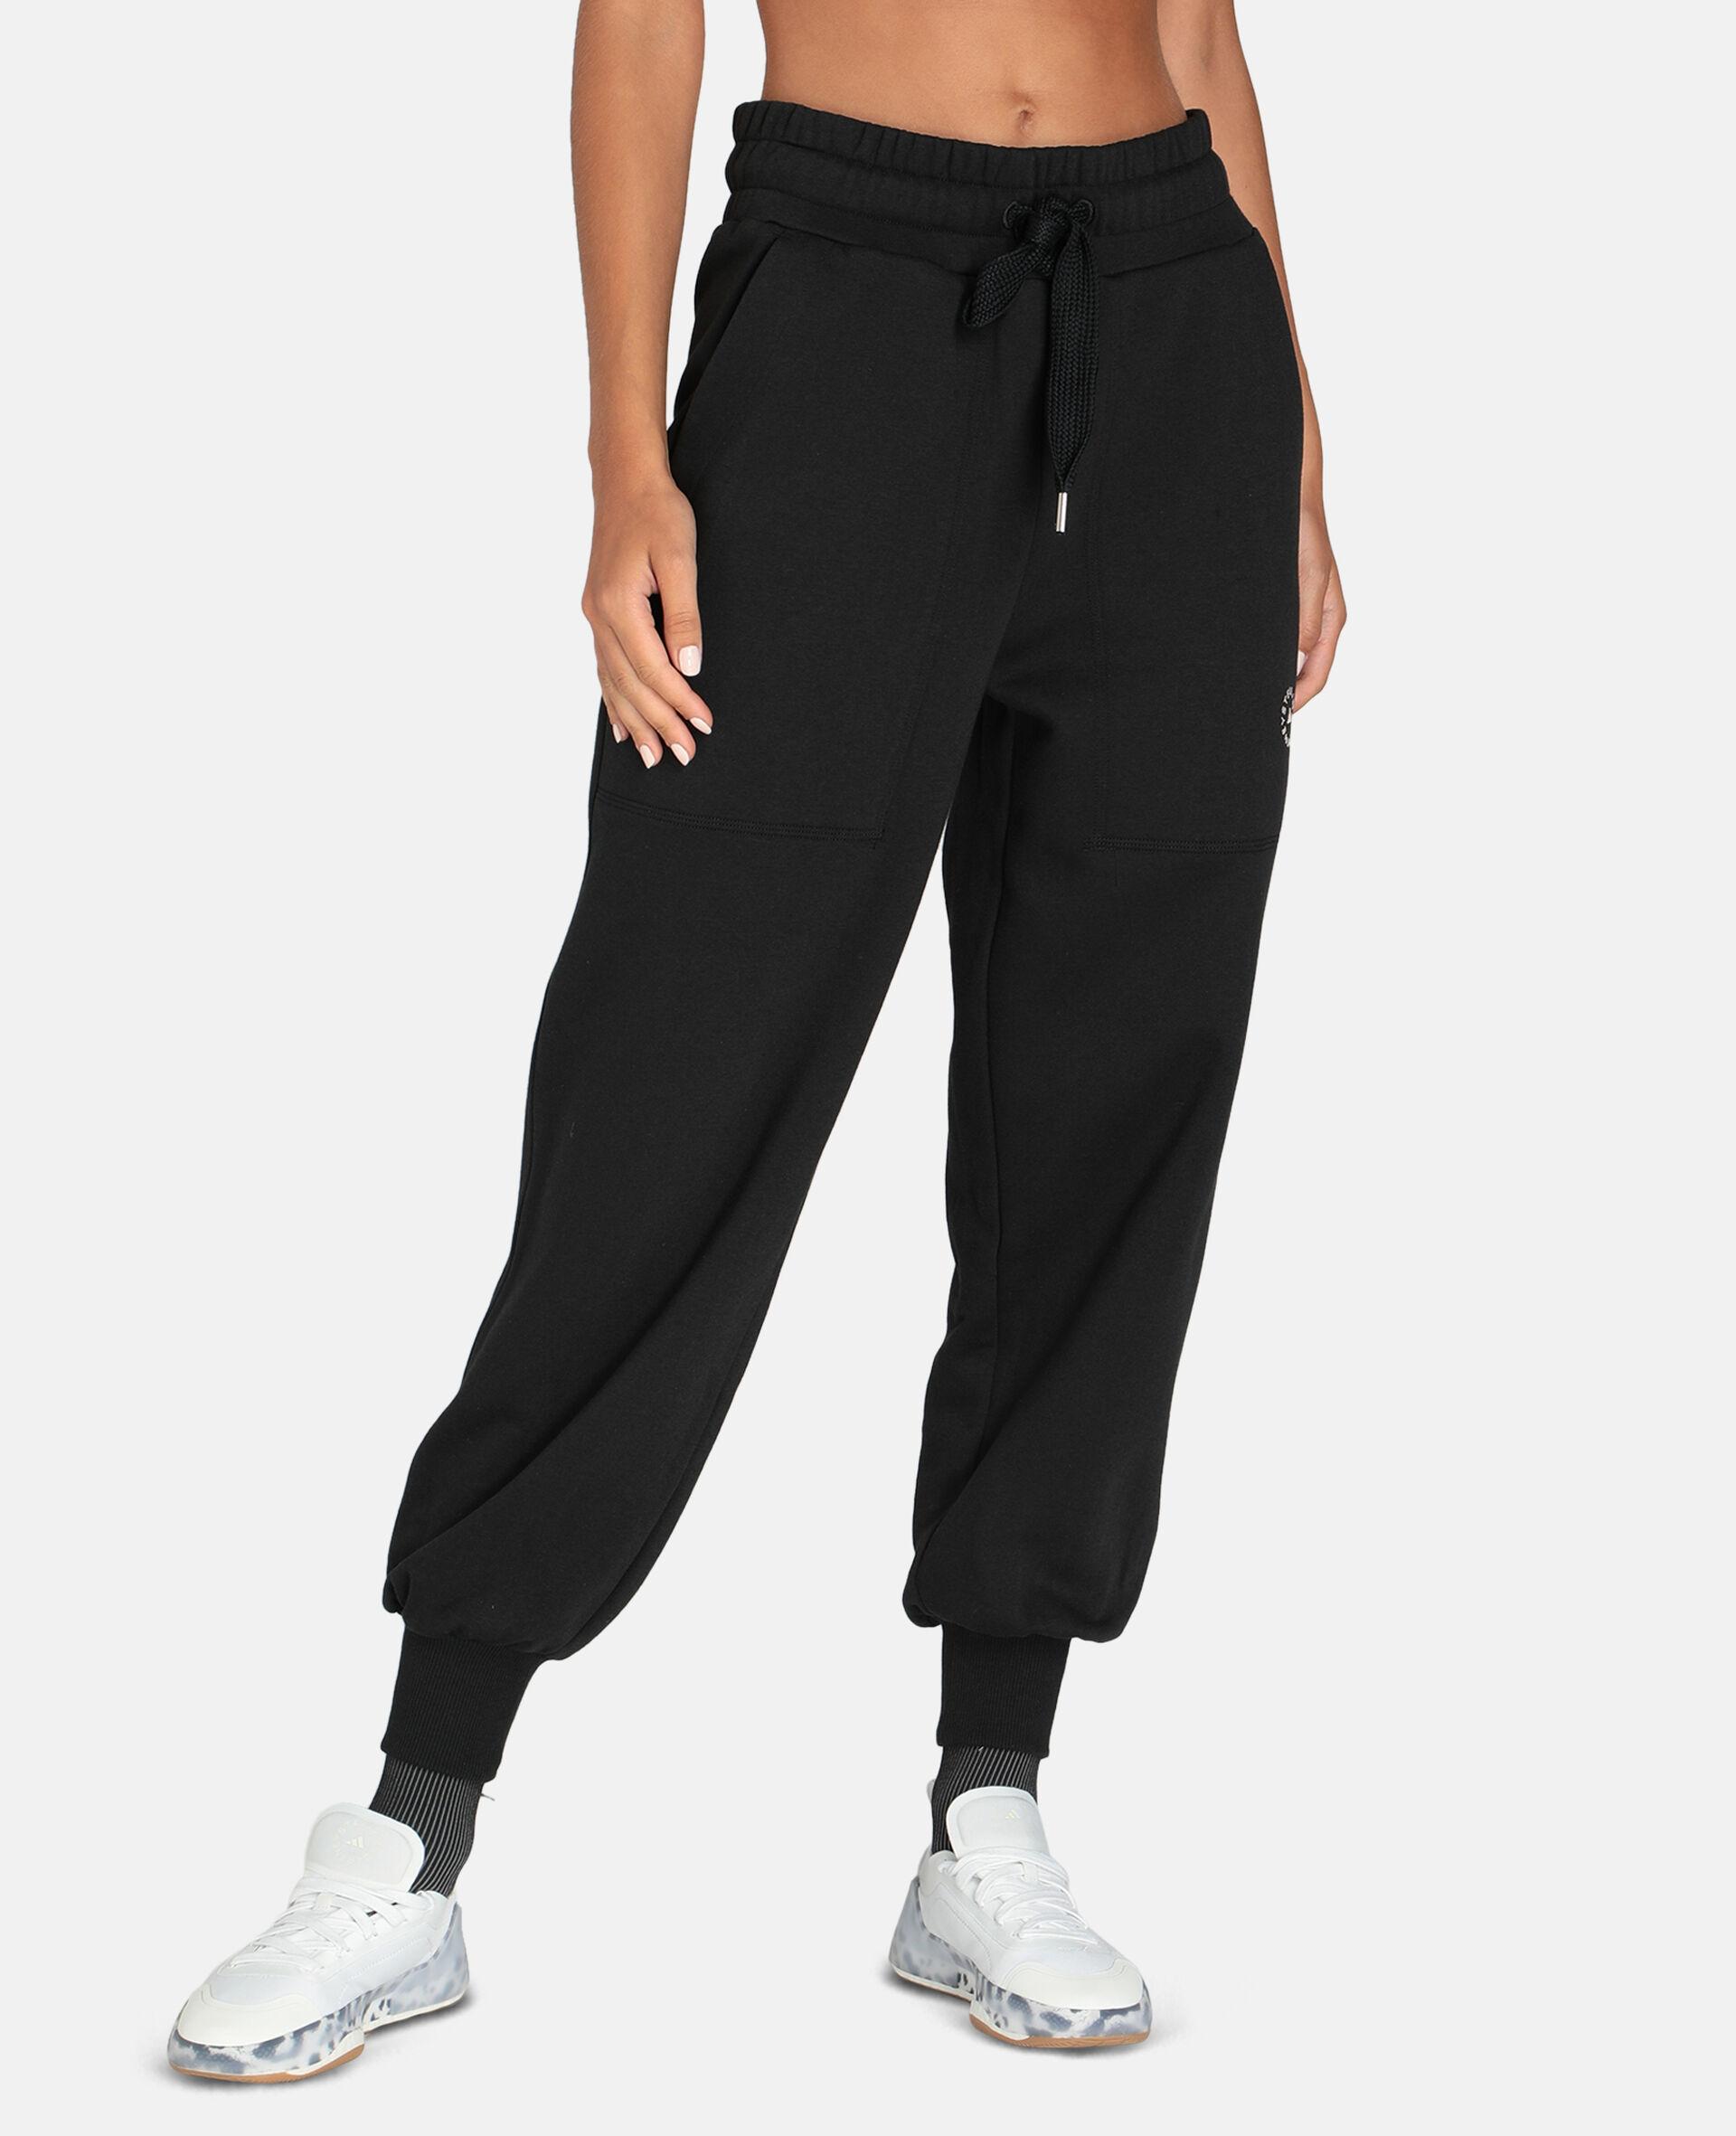 Grey Training Sweatpants-Black-large image number 4